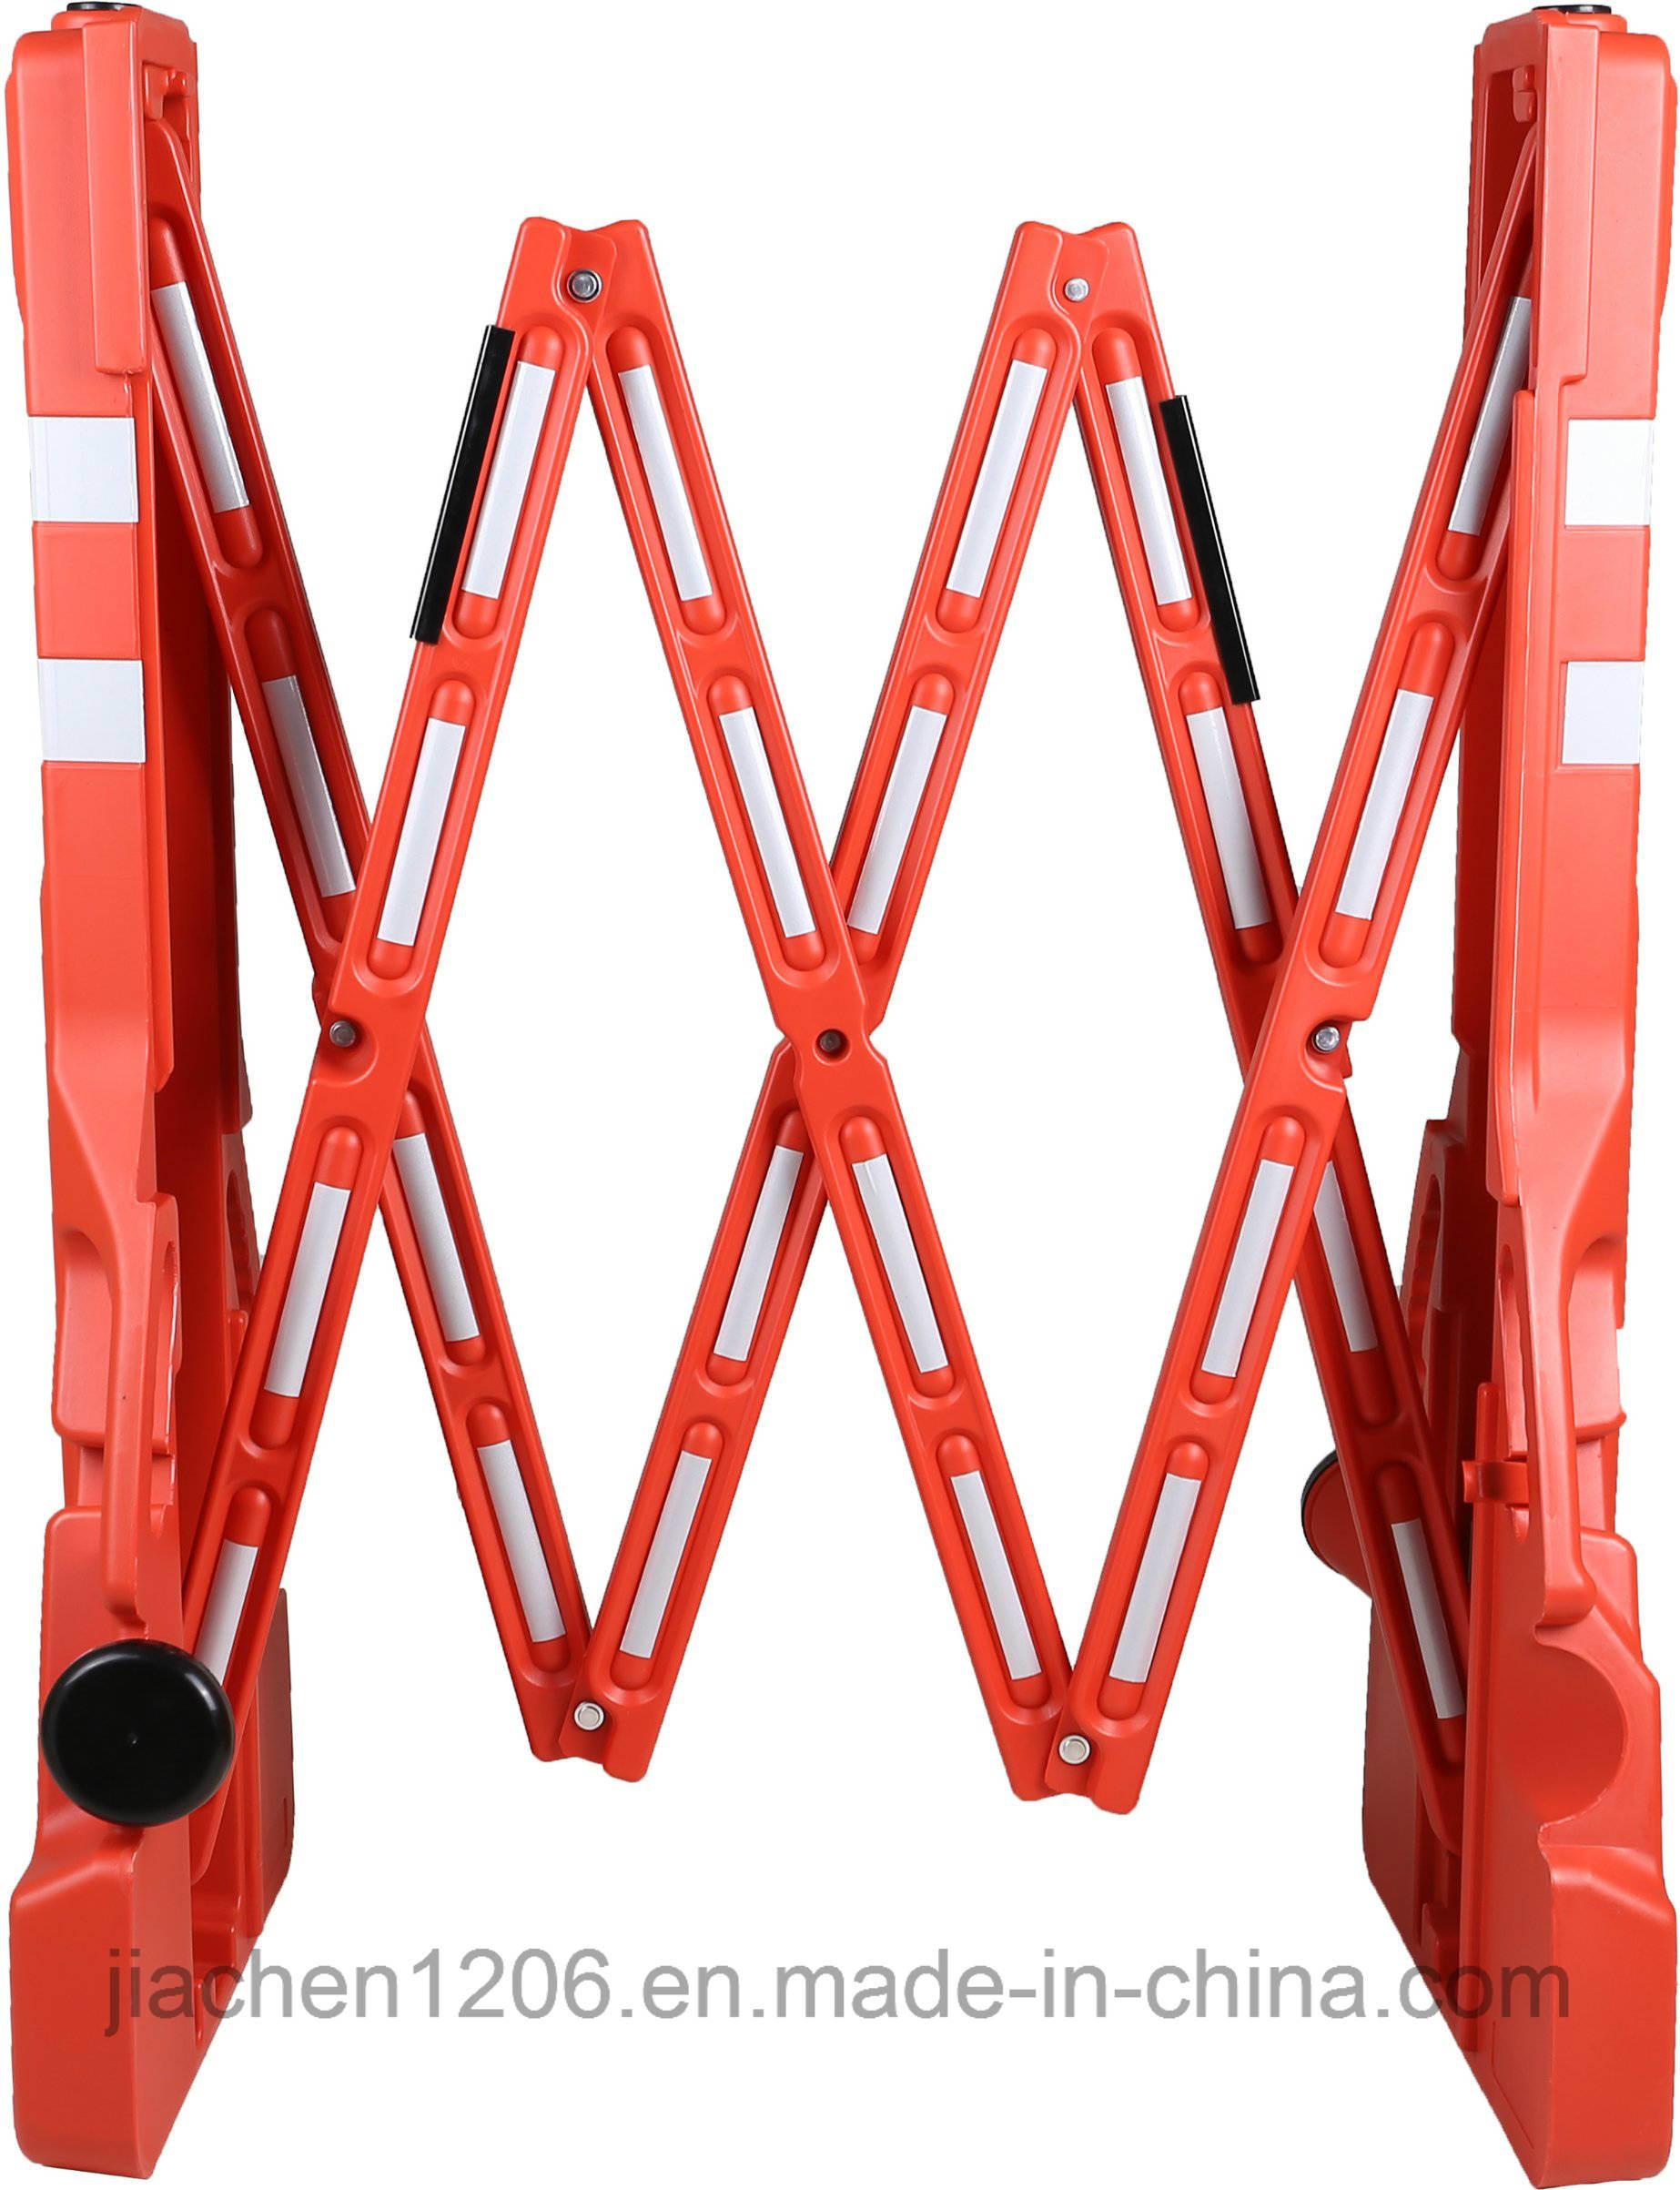 Wholesale Road Barricades Manufacturers Plastic Traffic Pedestrian Expandable Barricade